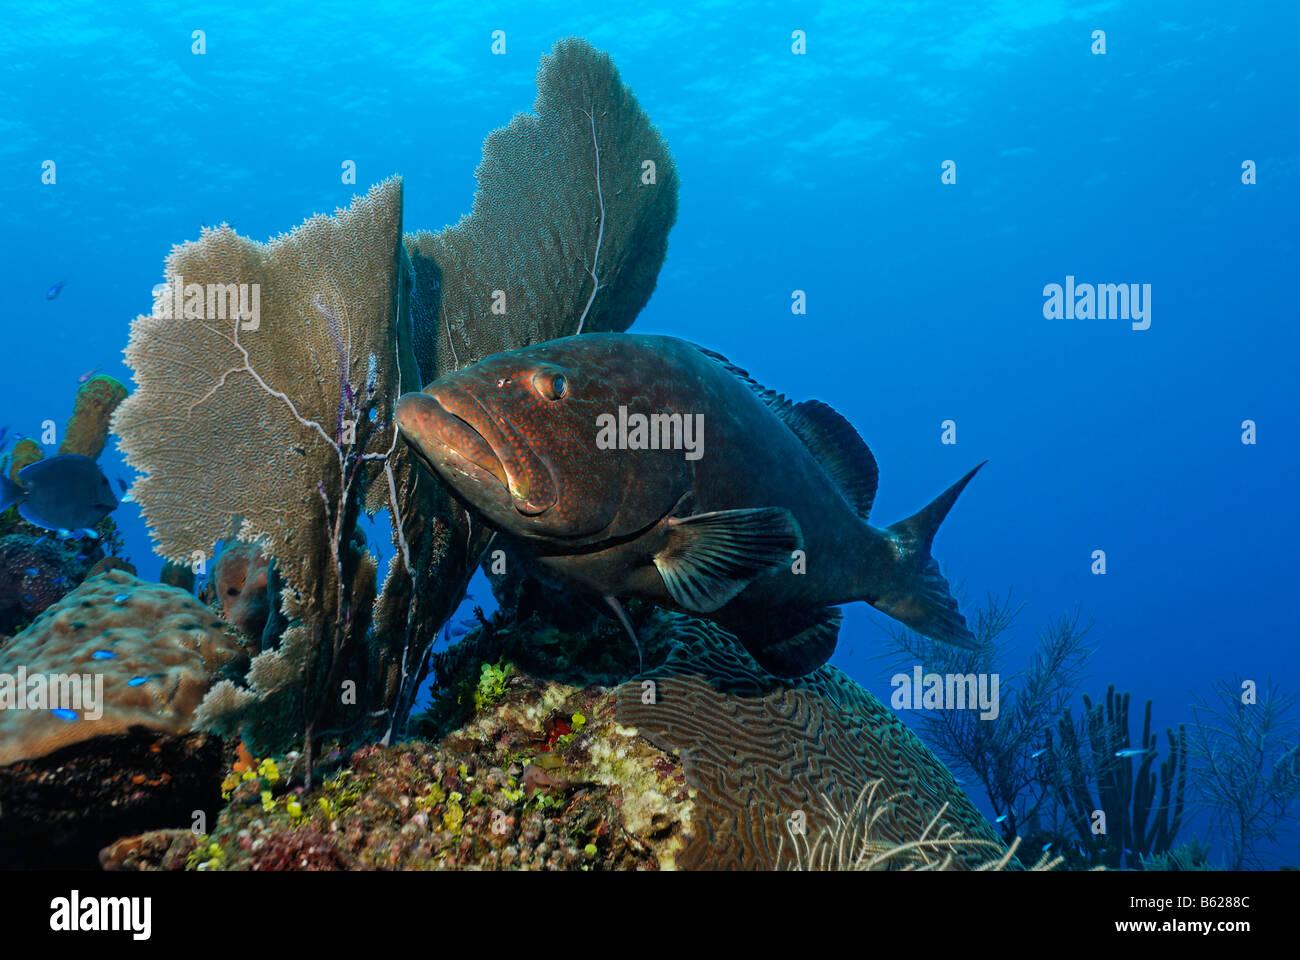 Black Grouper (Mycteroperca Bonaci) lauern hinter einer Venus Gorgonien (Gorgonia Flabellum) nach Beute, Hopkins, Stockbild